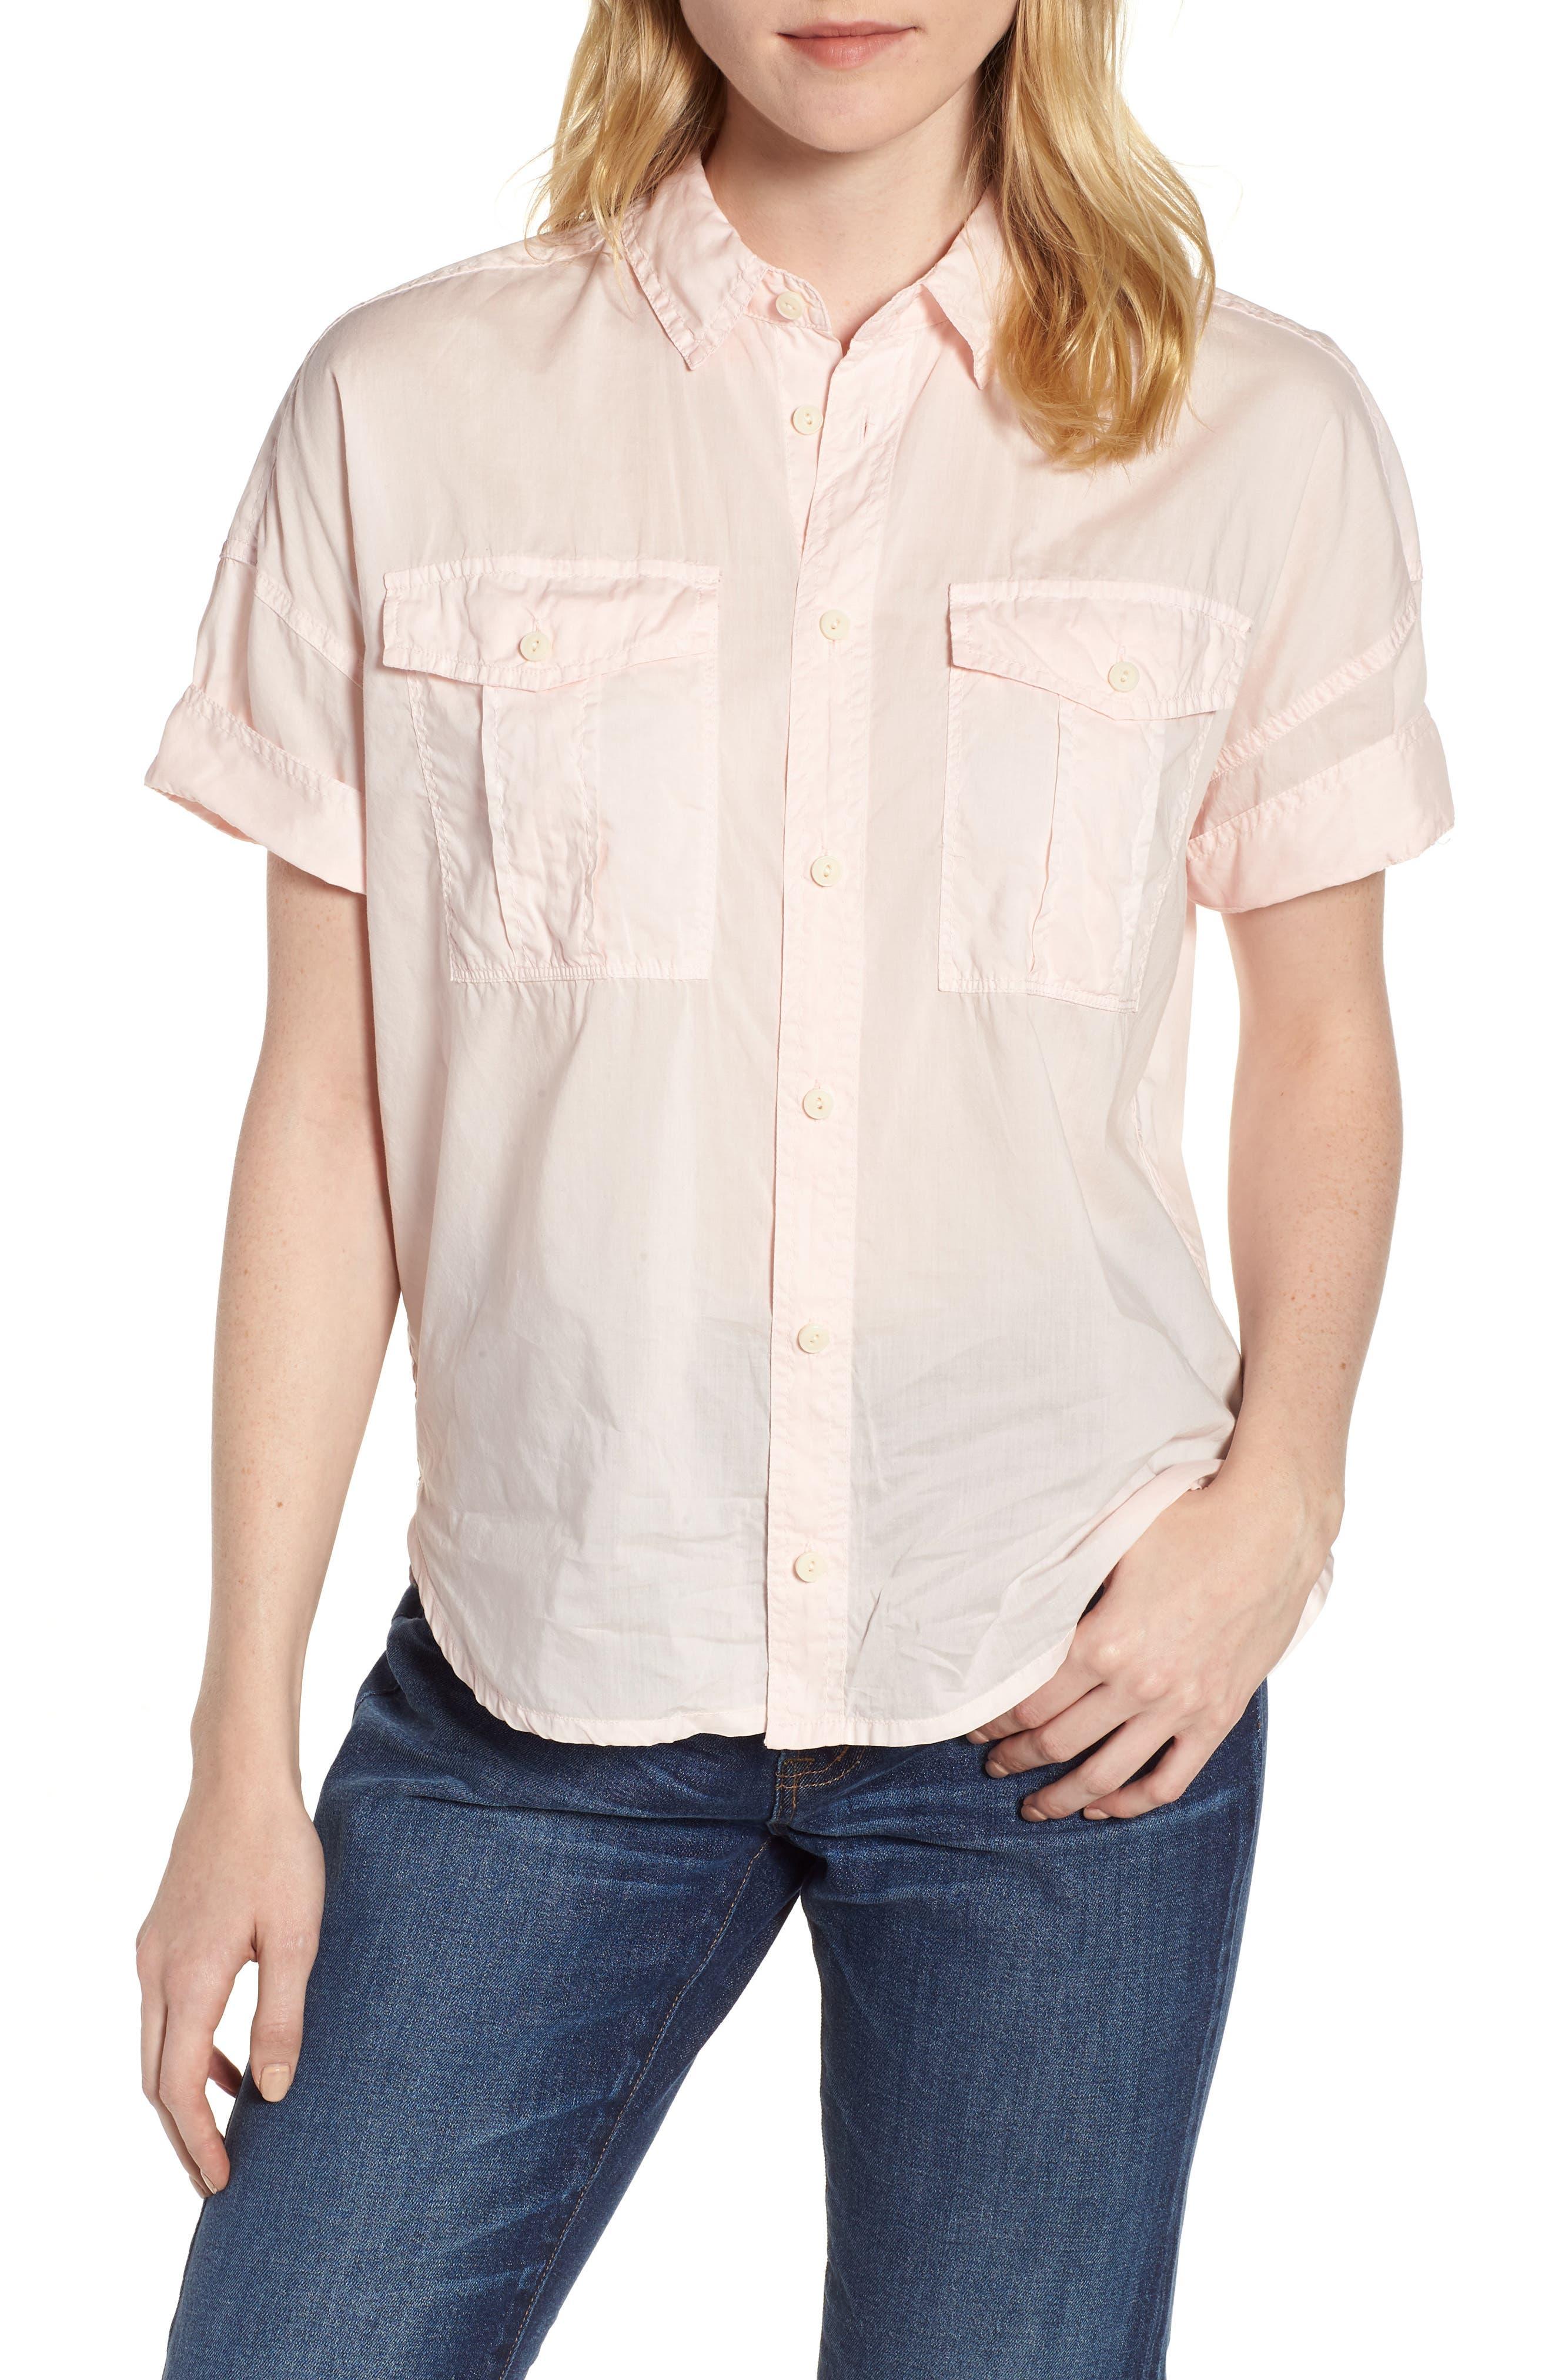 J.Crew Utility Pocket Shirt,                             Main thumbnail 1, color,                             Pastel Pink